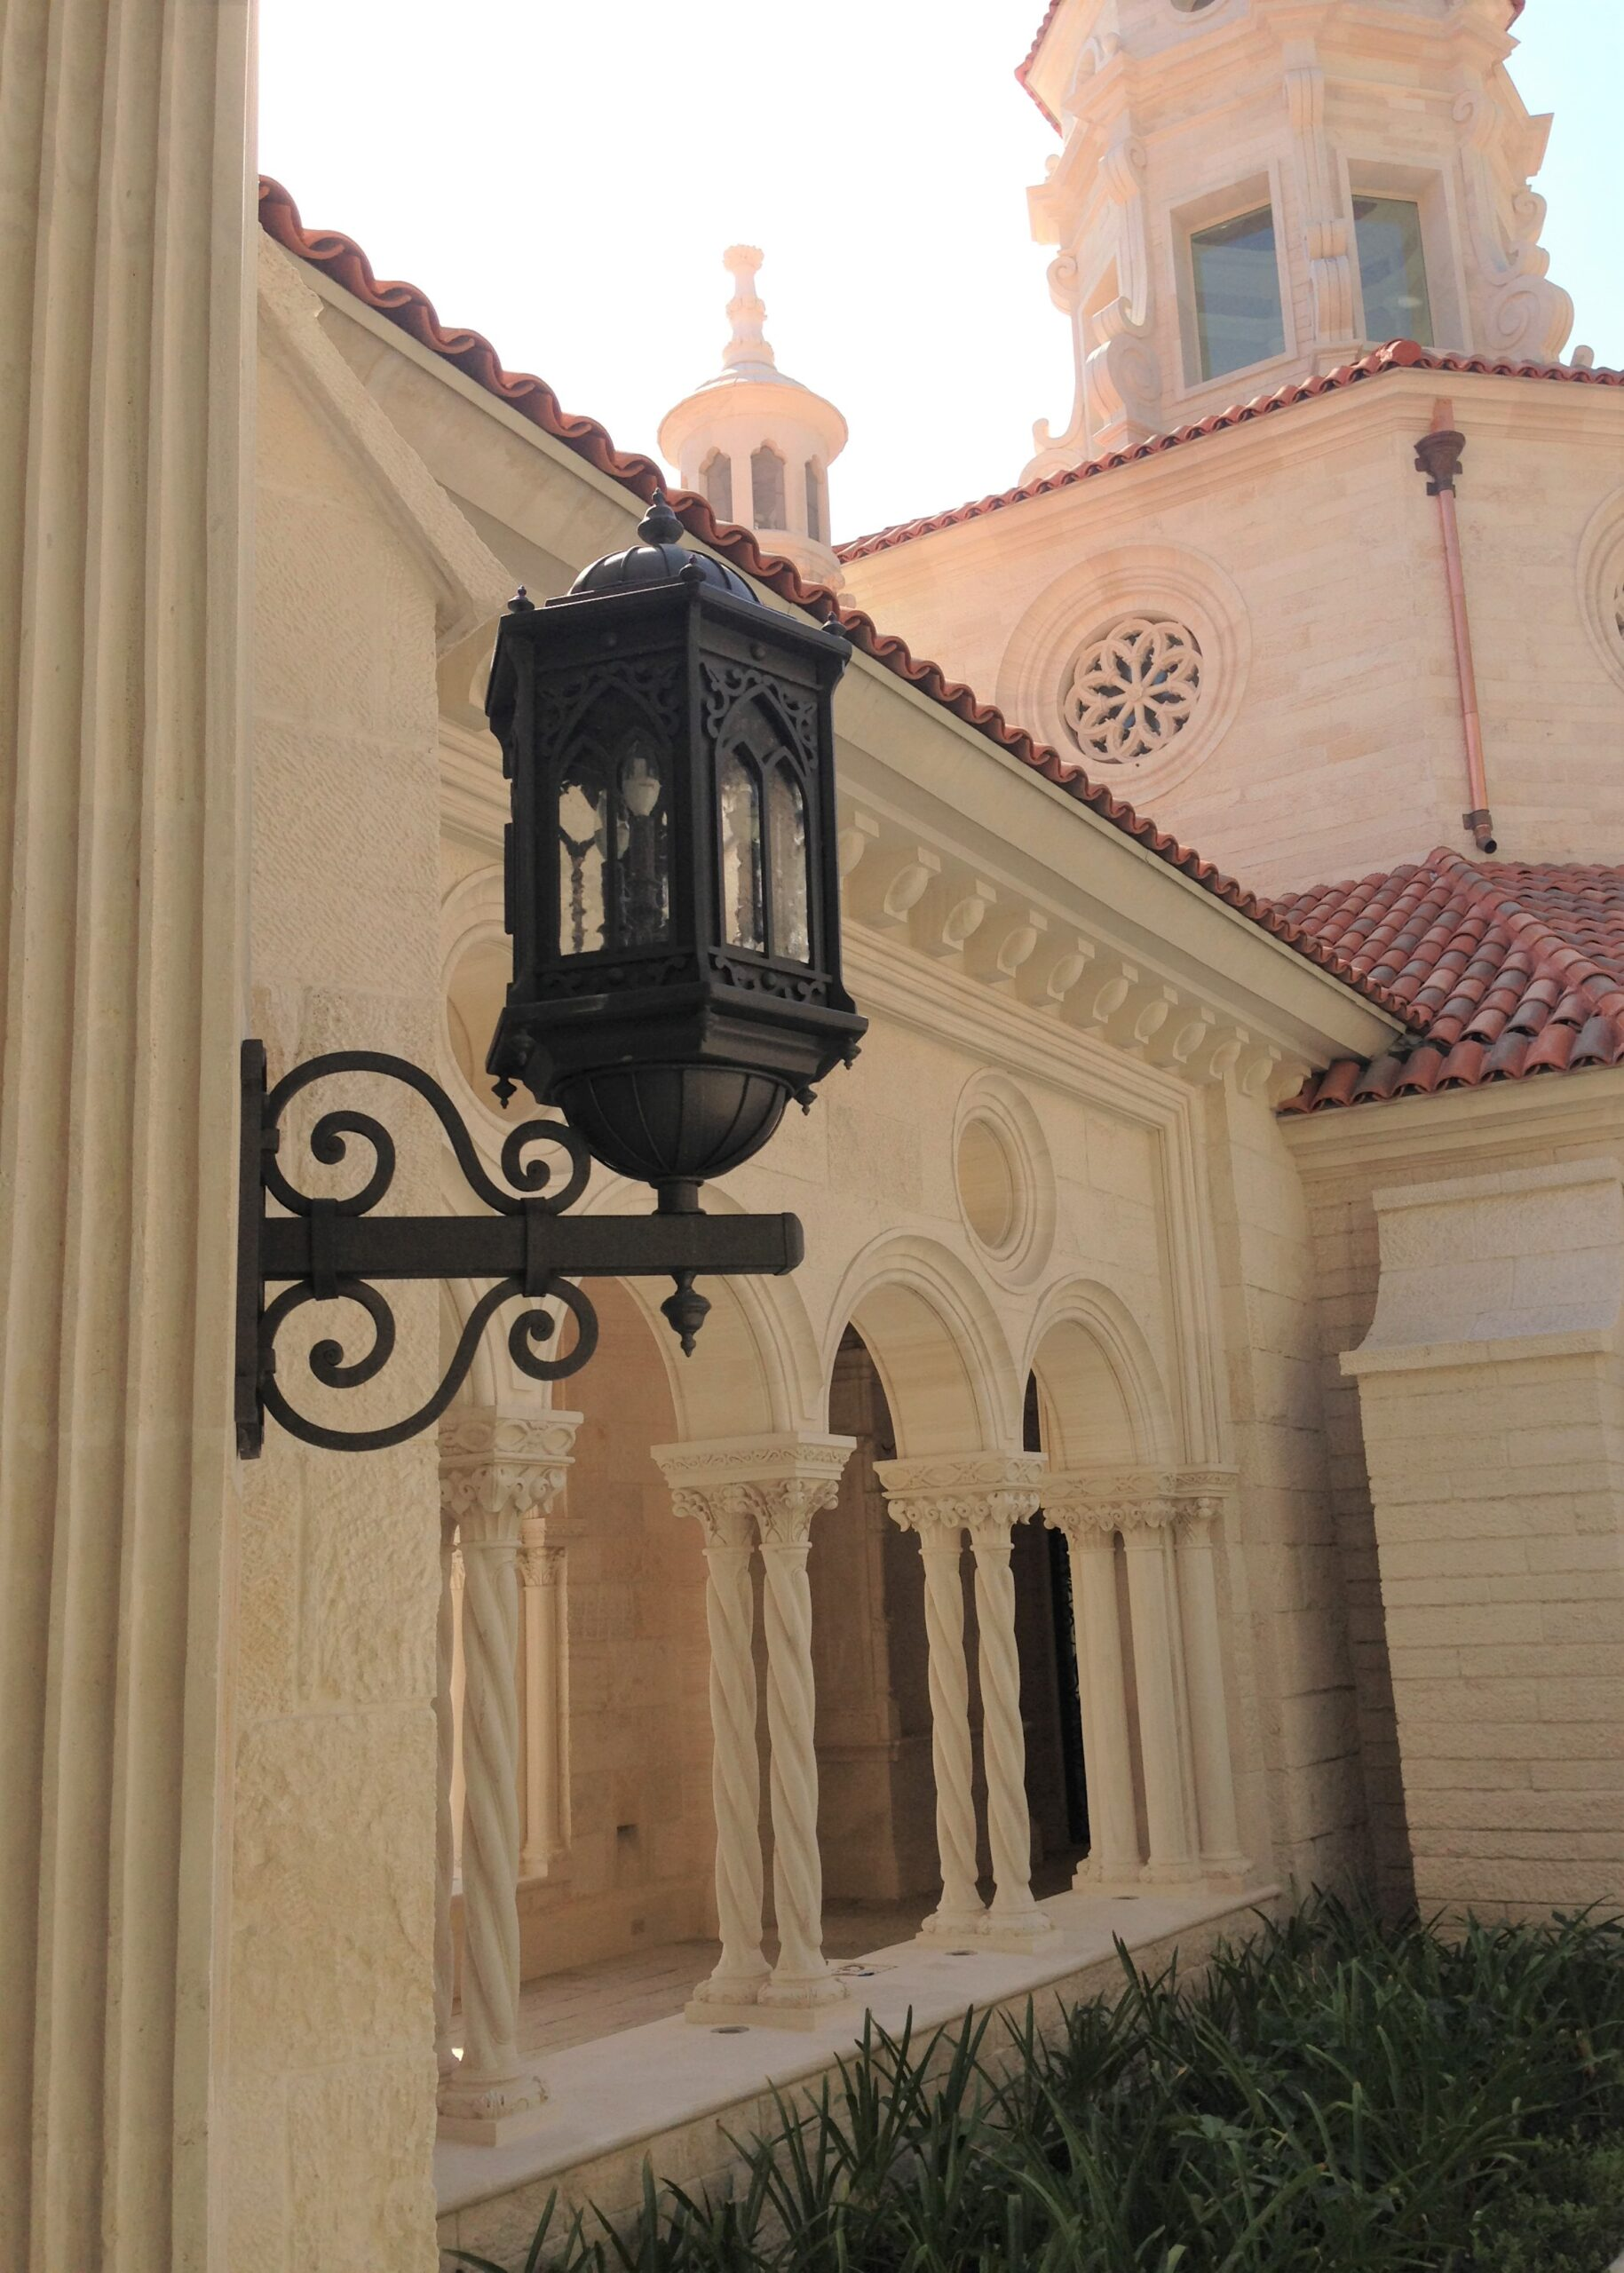 solara-custom-classic-steel-outdoor-lighting-patio-barcelona